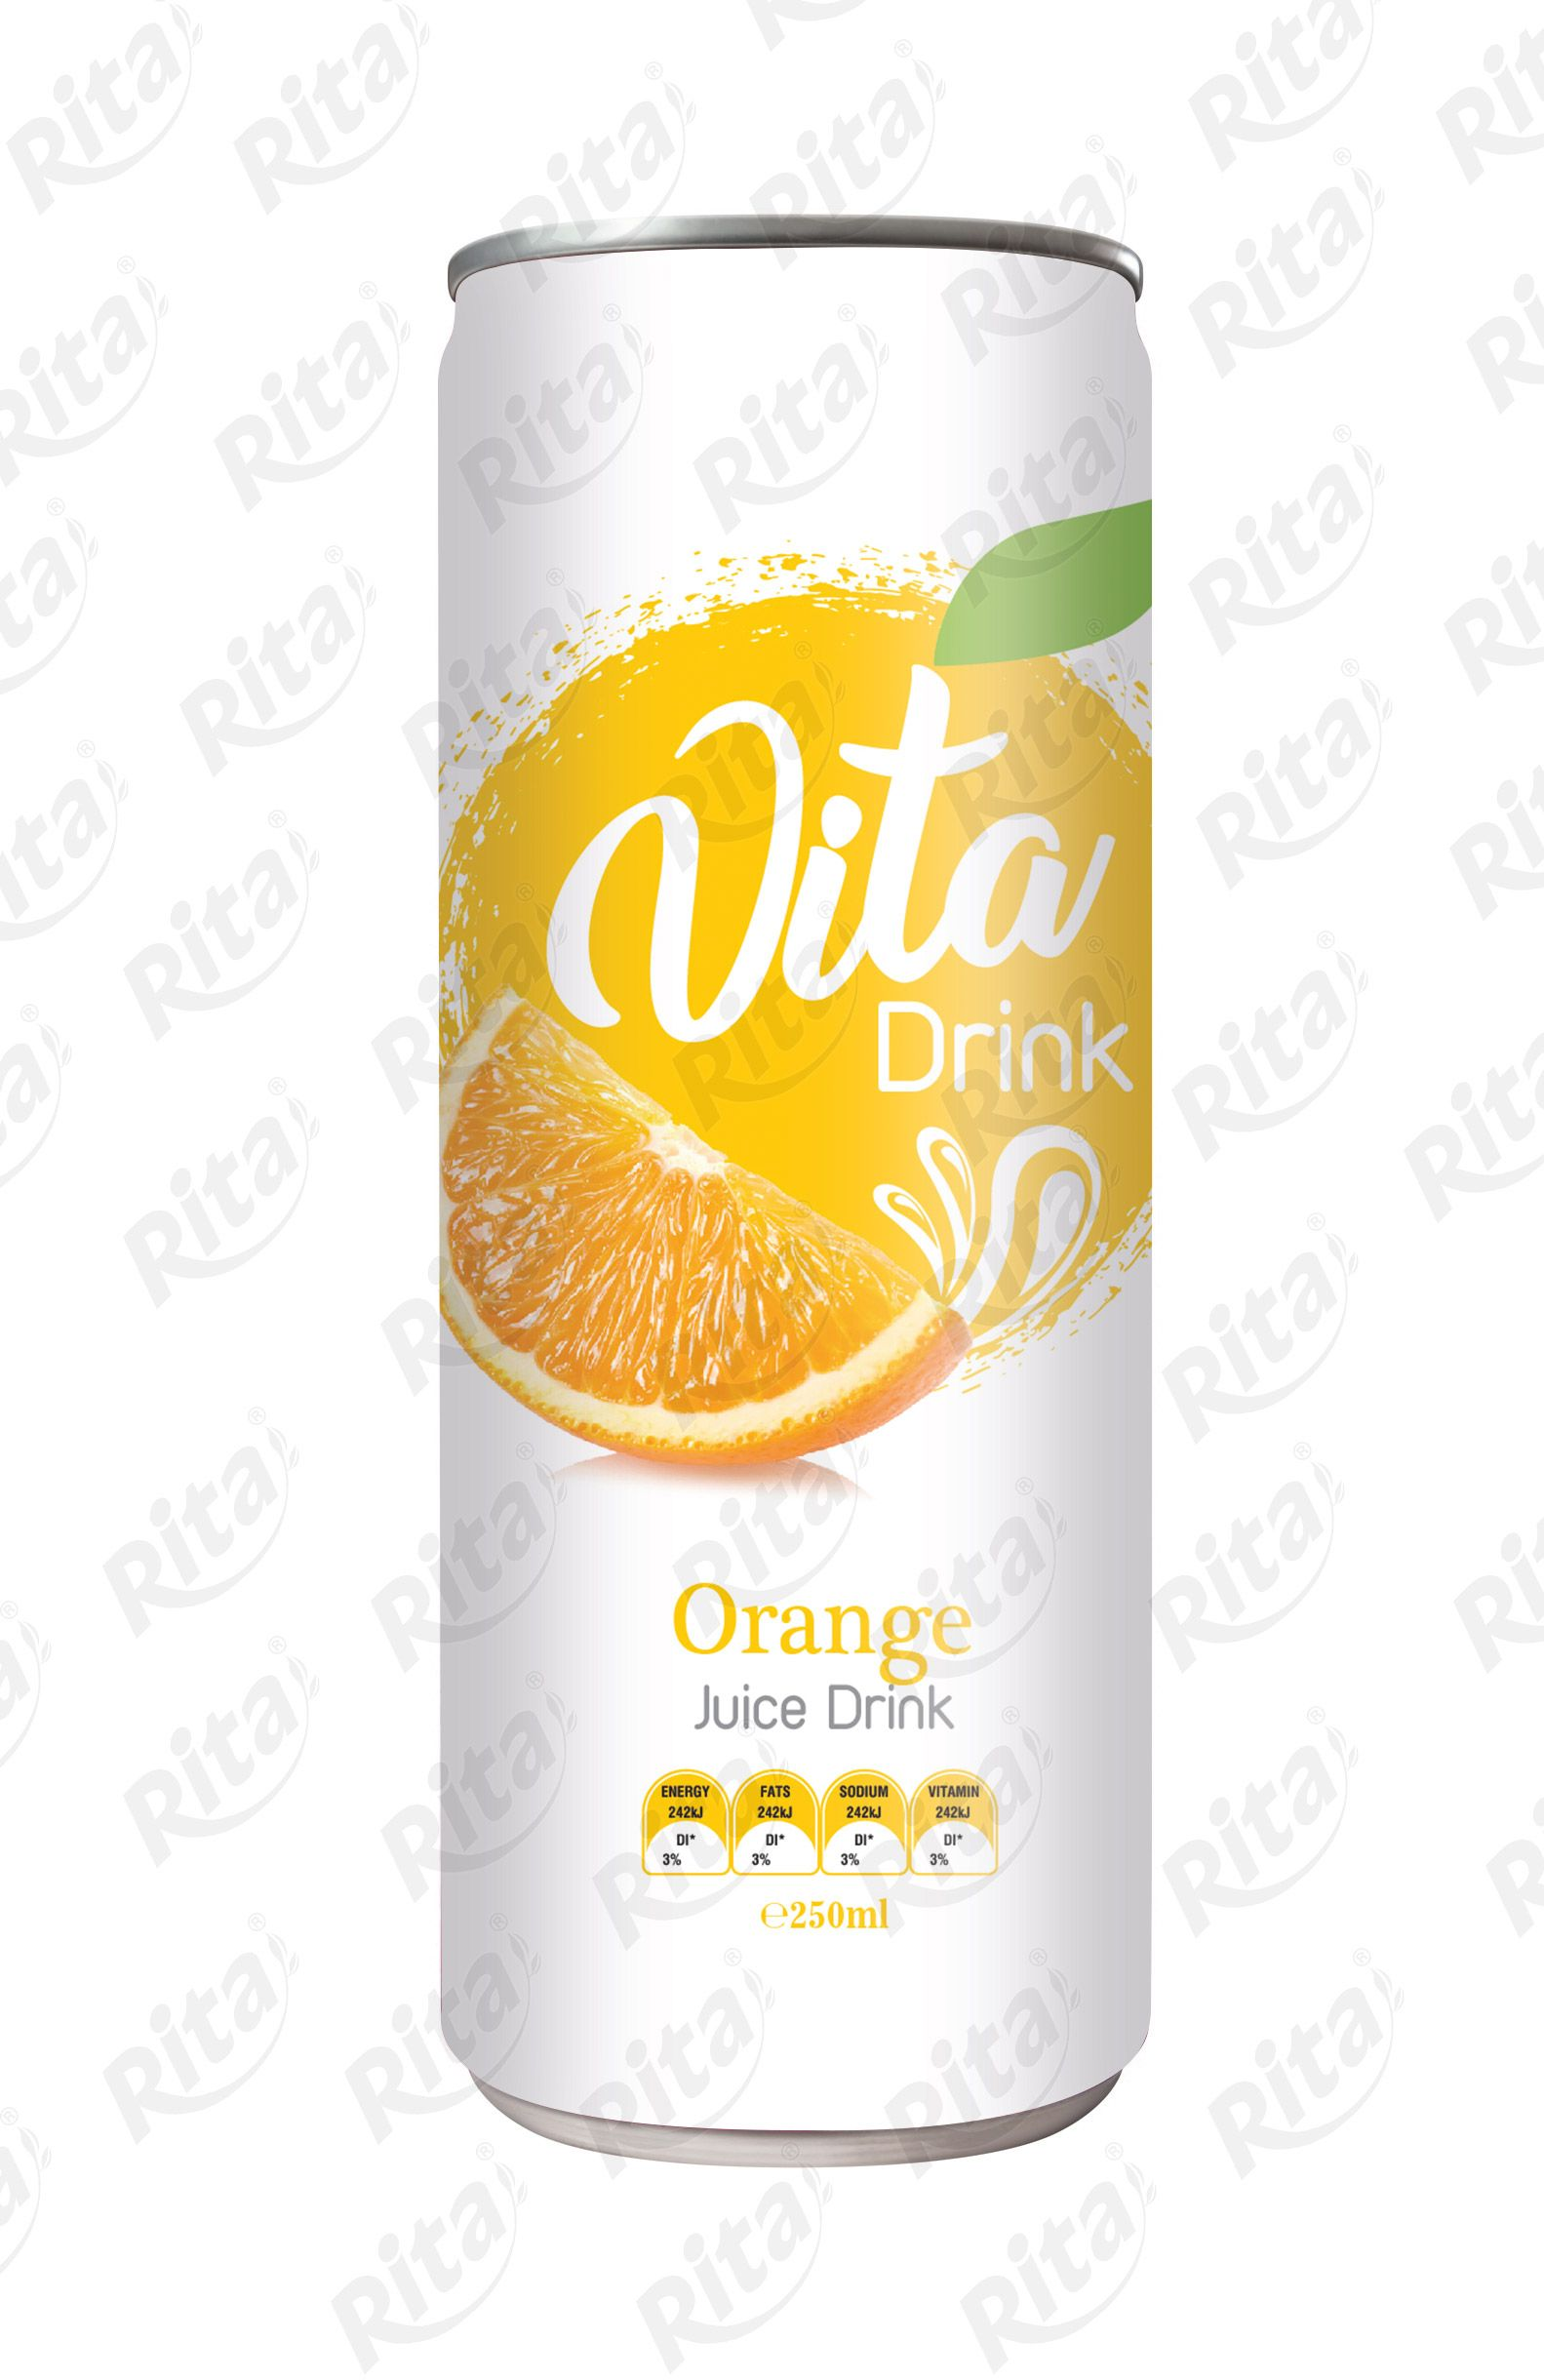 Orange juice drink 250mml thiết kế truyền cảm hứng